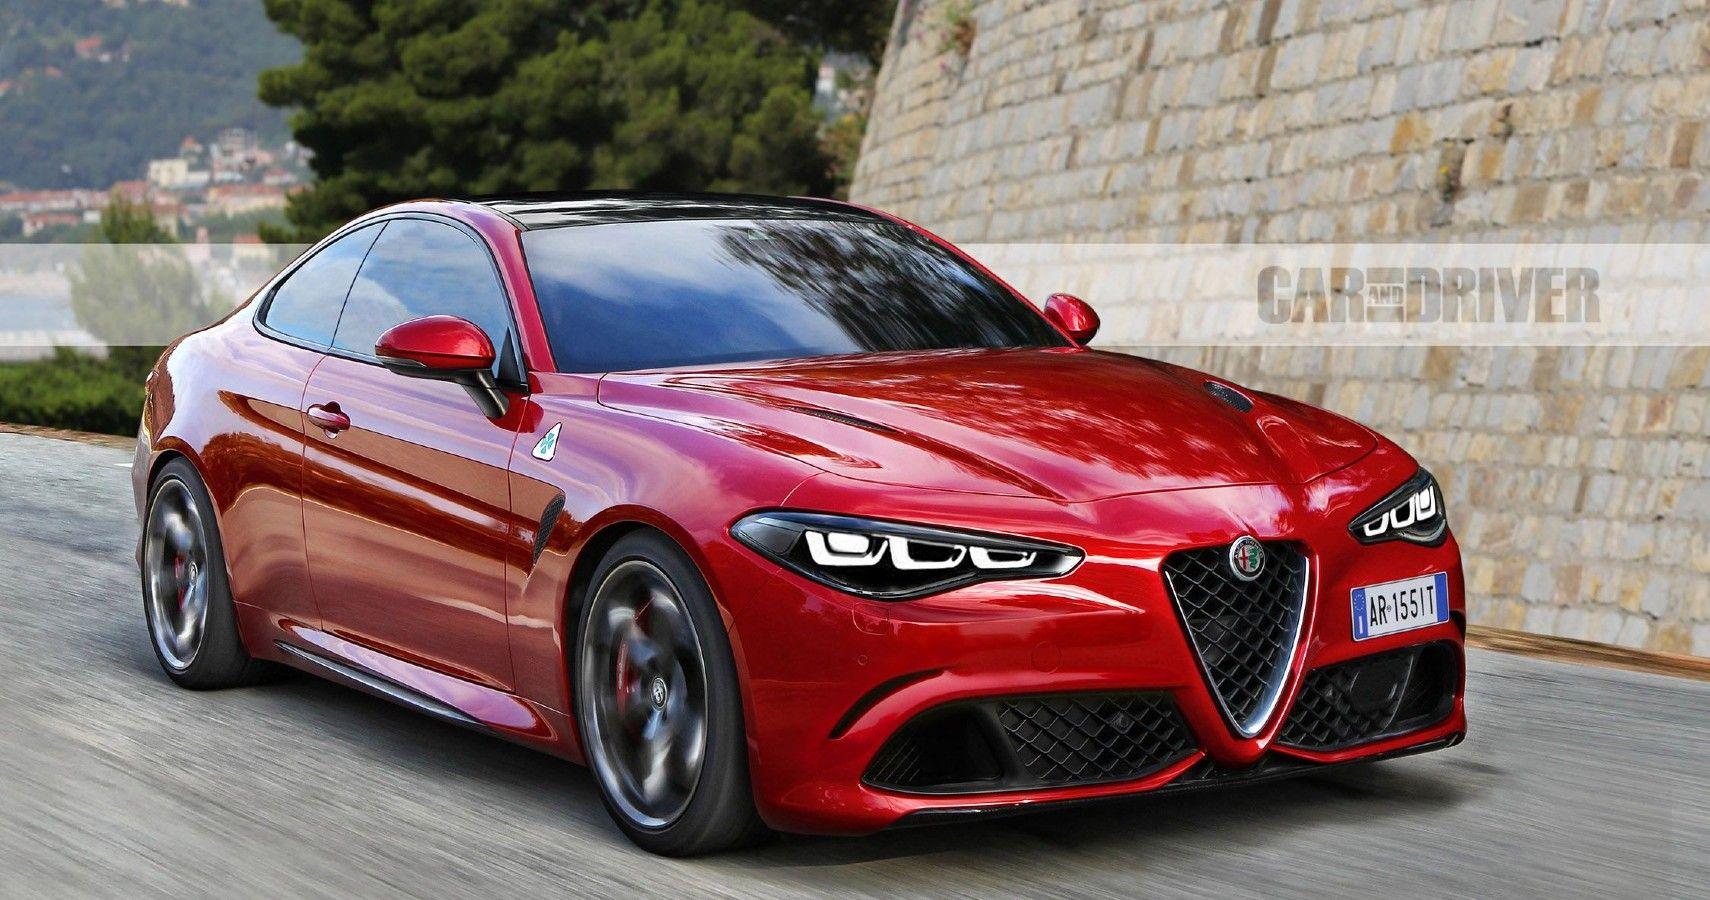 2021 Alfa Romeo GTV: What We Know So Far | HotCars